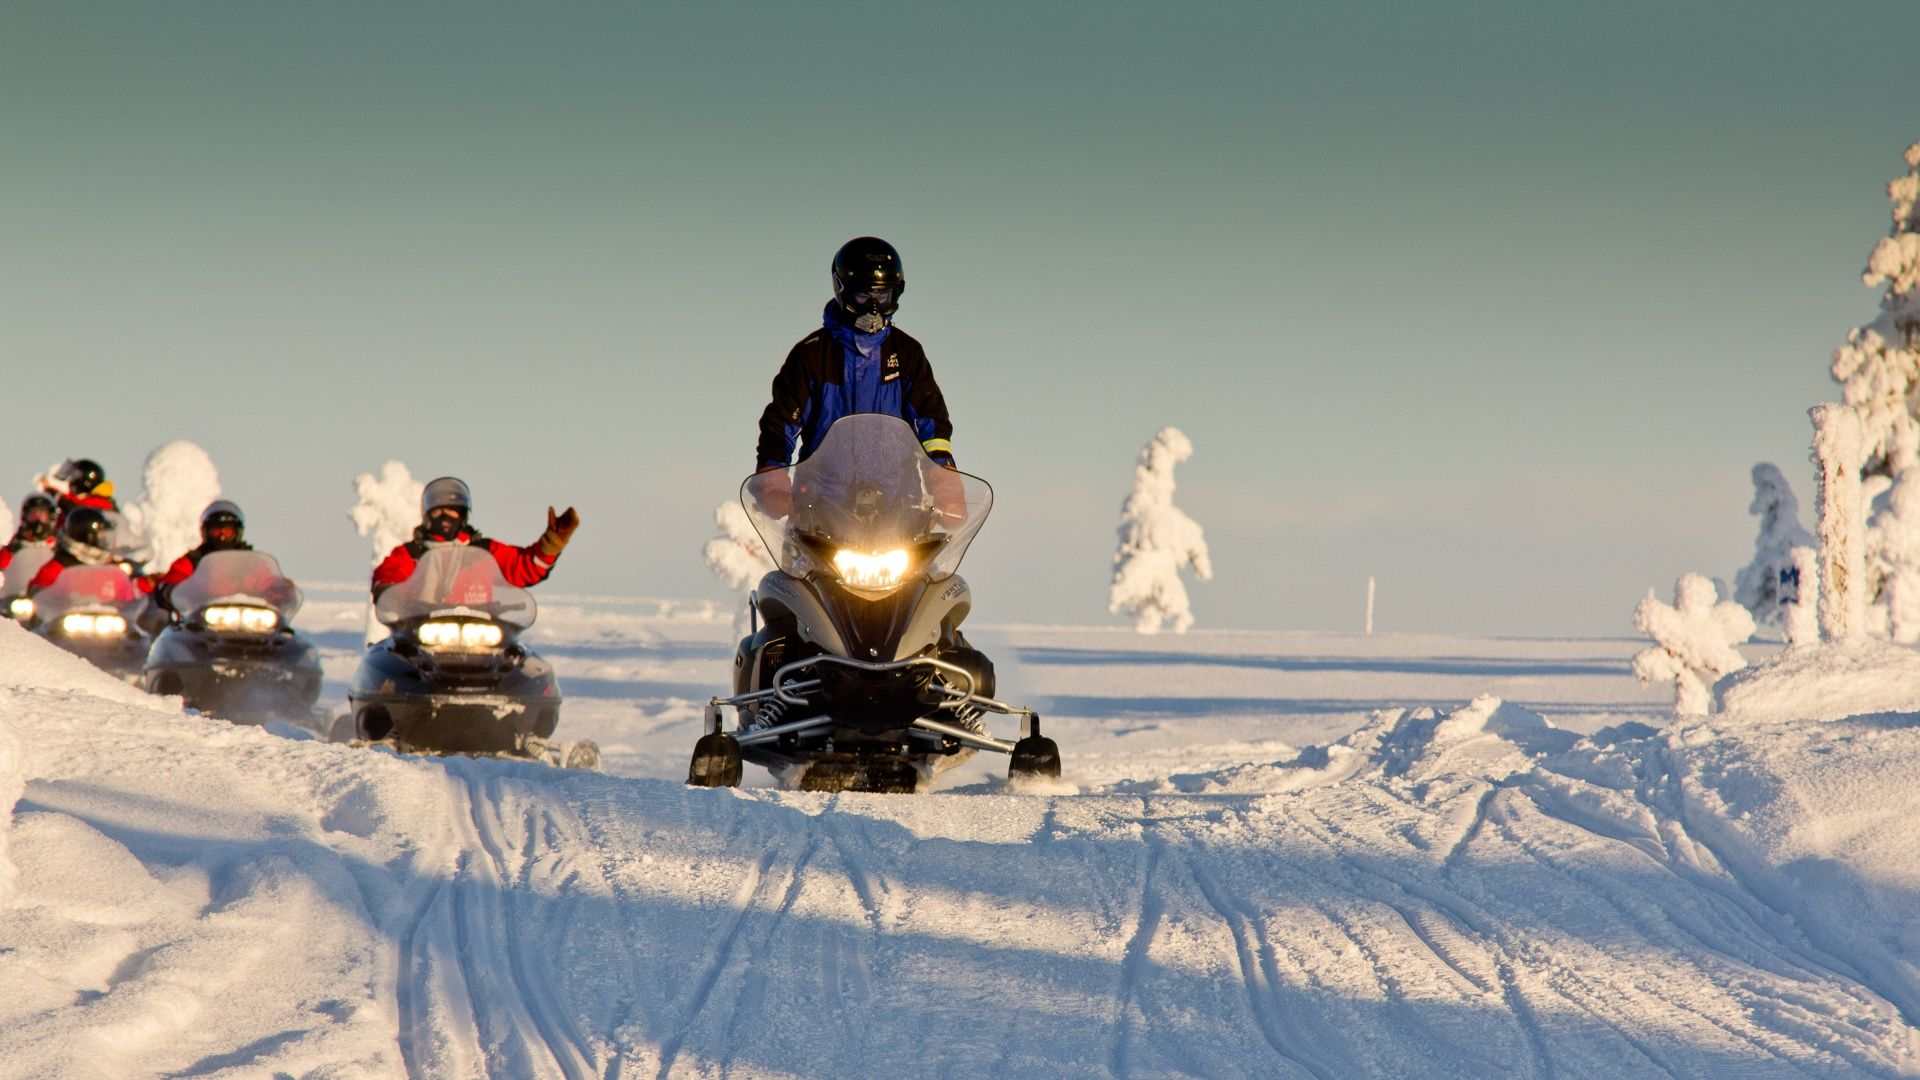 Lapland Safaris Seasonal work in Lapland